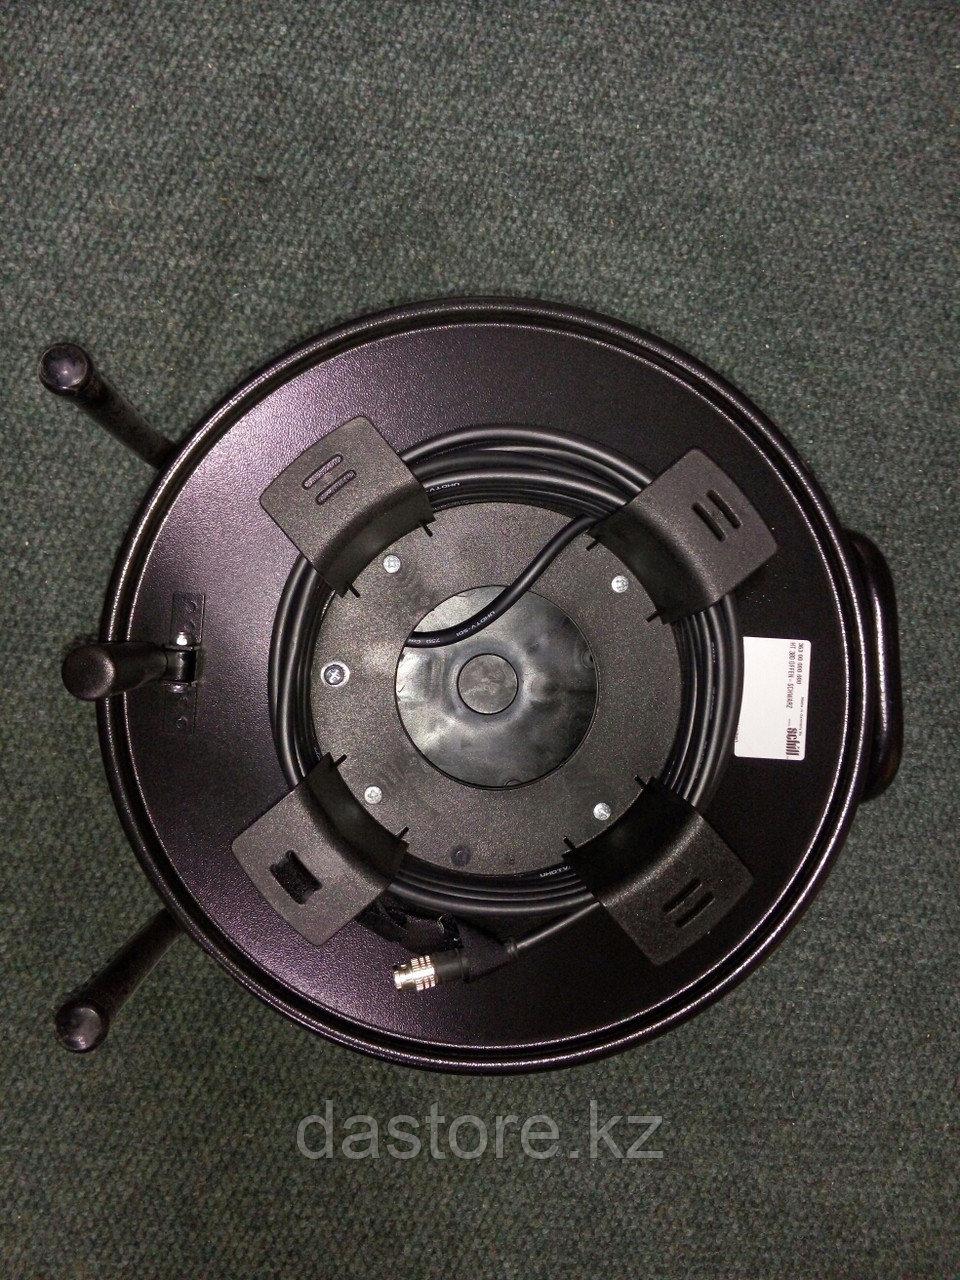 DaStore Products VIDBM-100HT-CFW готовый видеокабель HD-SDI с BNC разъёмами, на катушке, длина 100 метров